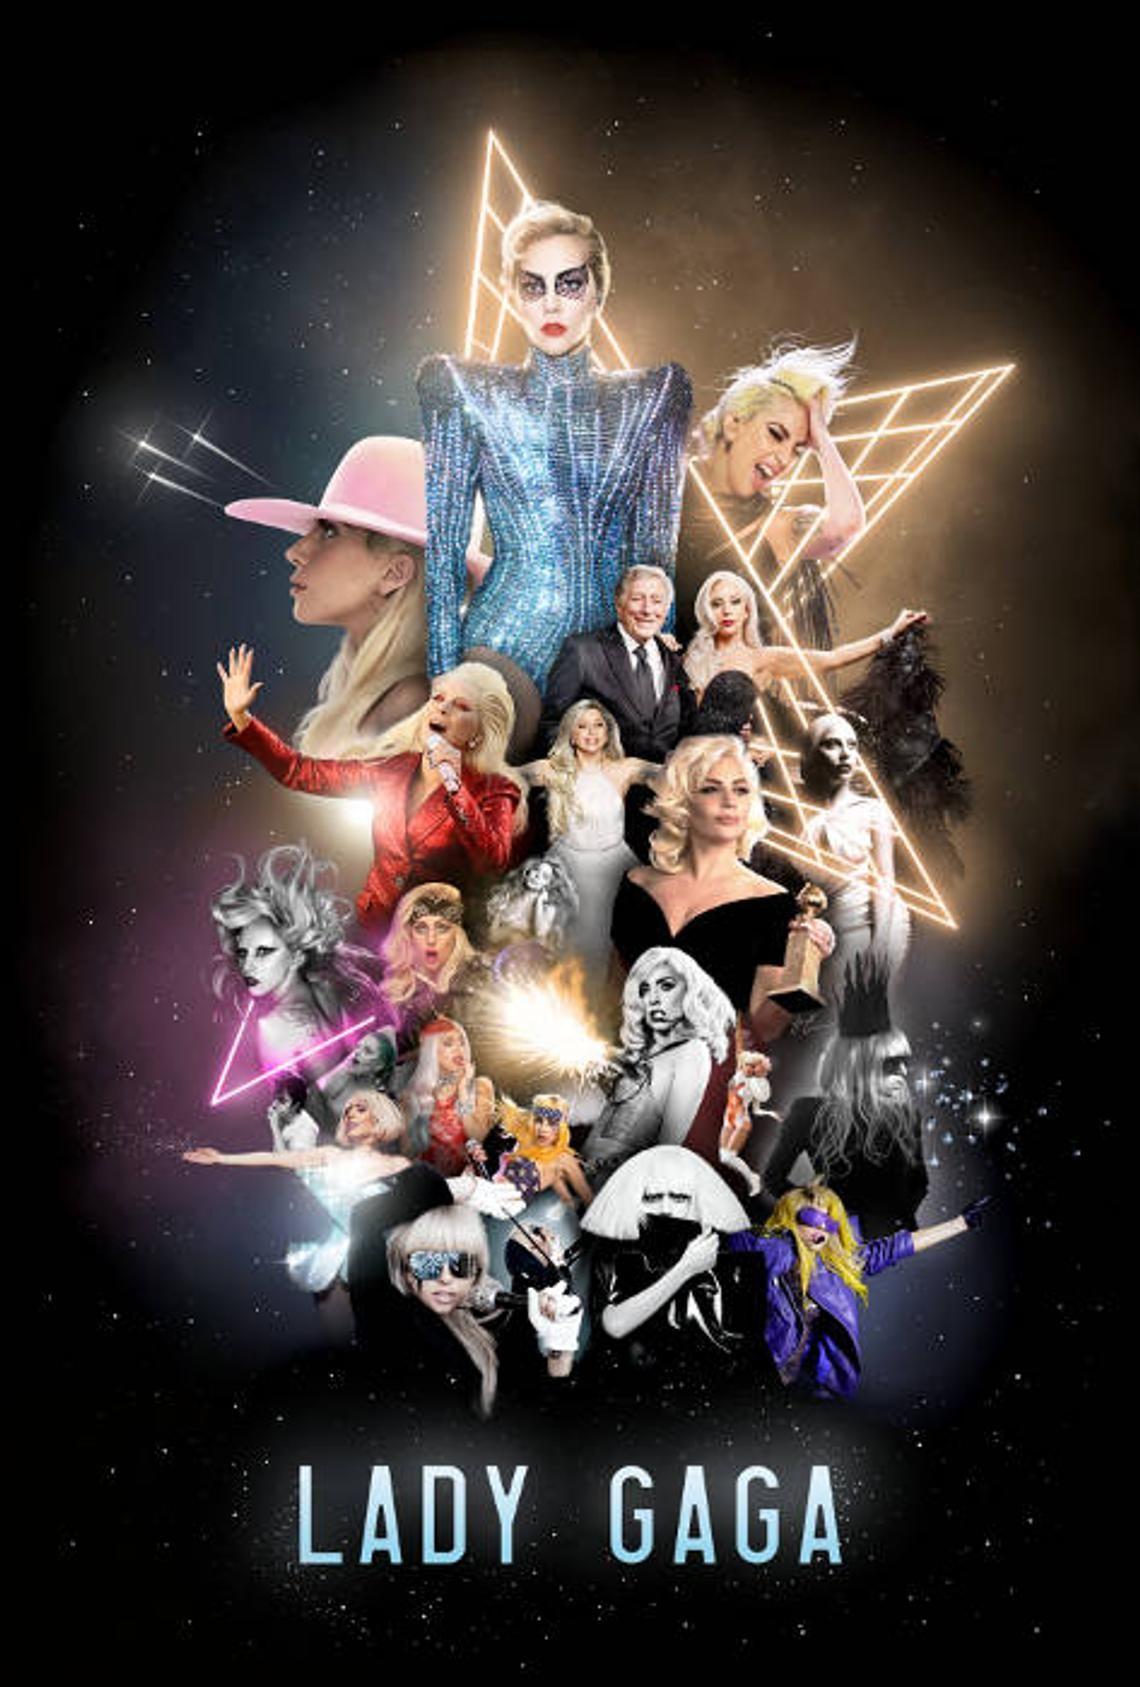 Pin De Erika S Em Iphone Wallpapers Fotos Lady Gaga Lady Gaga Artpop Lady Gaga